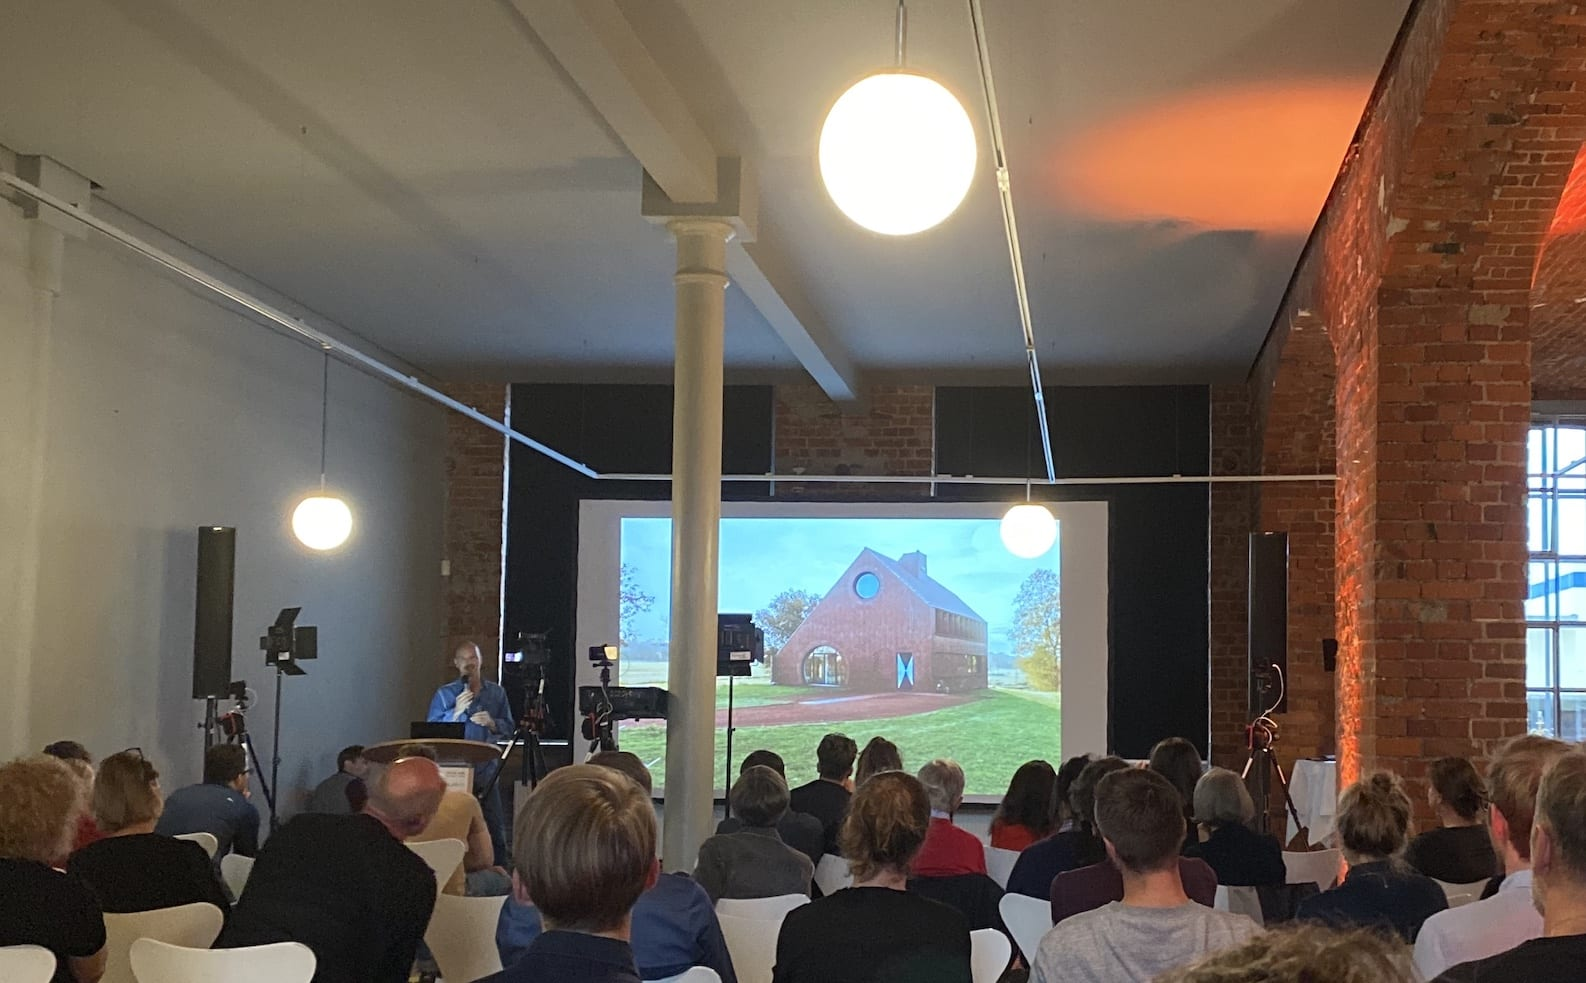 Vortrag von Thomas Kröger (tka, Berlin) bei den Dachkult-Rooftop Talks #9 (Foto: Dachkult)